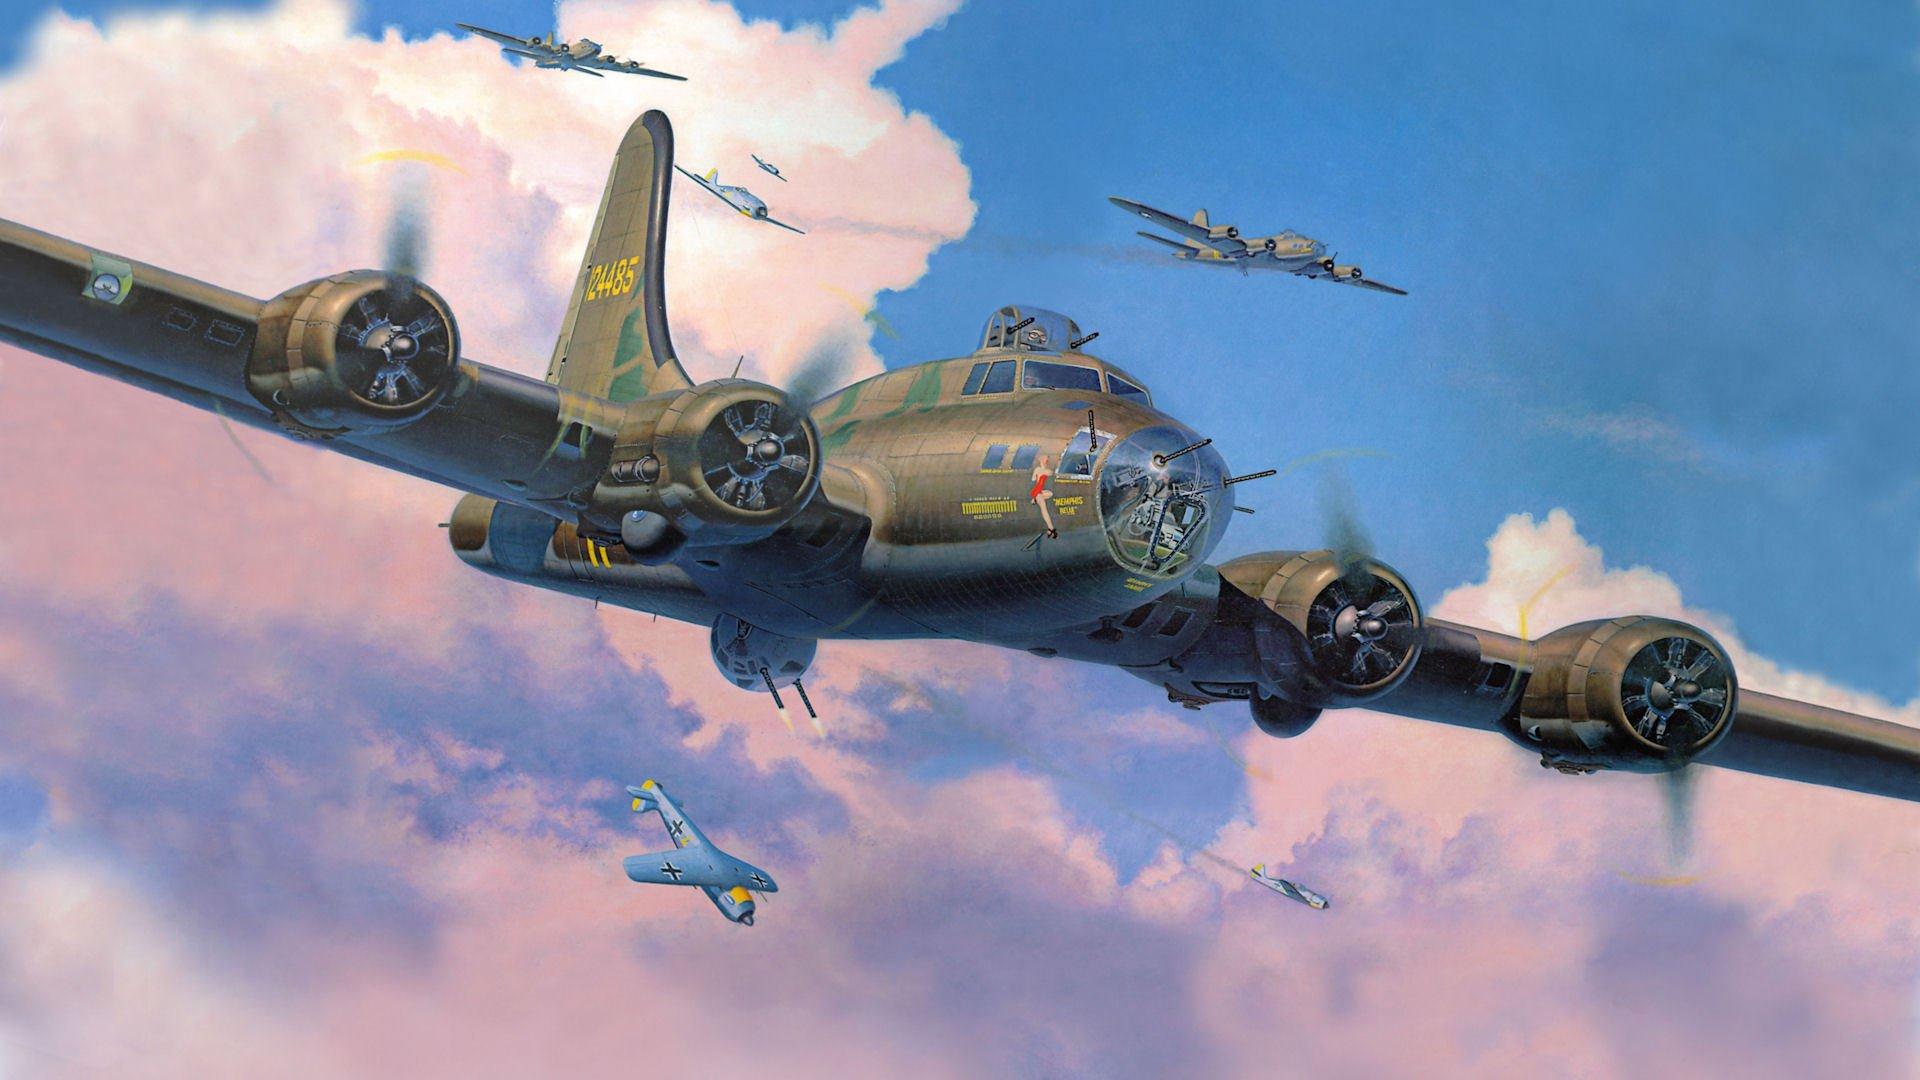 Обои Самолёт, B 17. Авиация foto 17